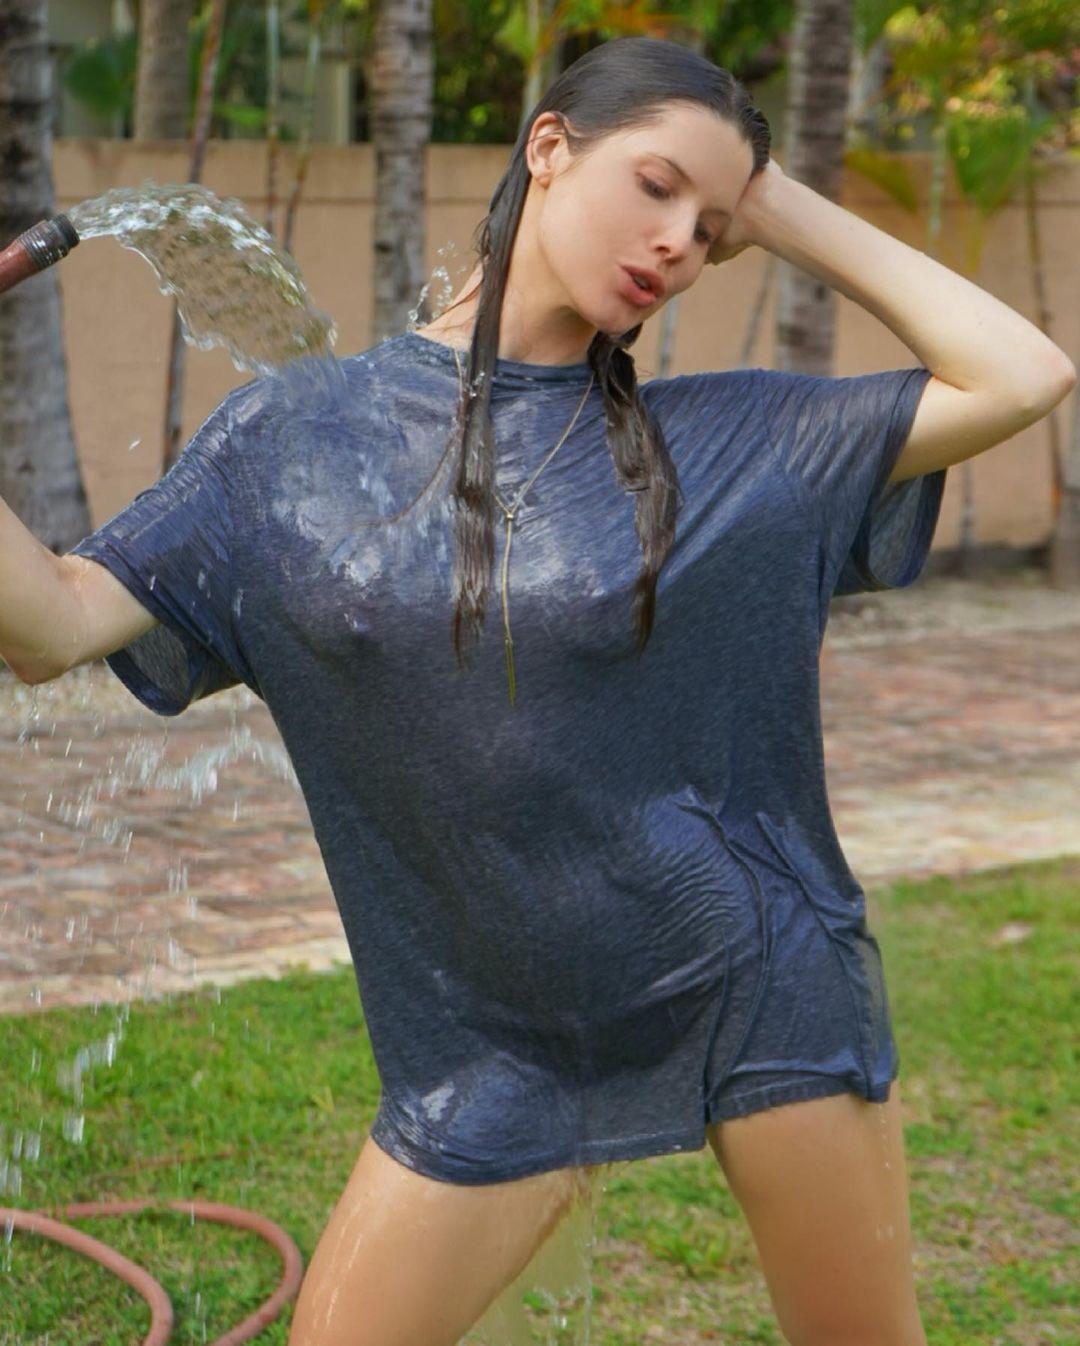 Amanda Cerny Wet T Shirt Picture Set 0001